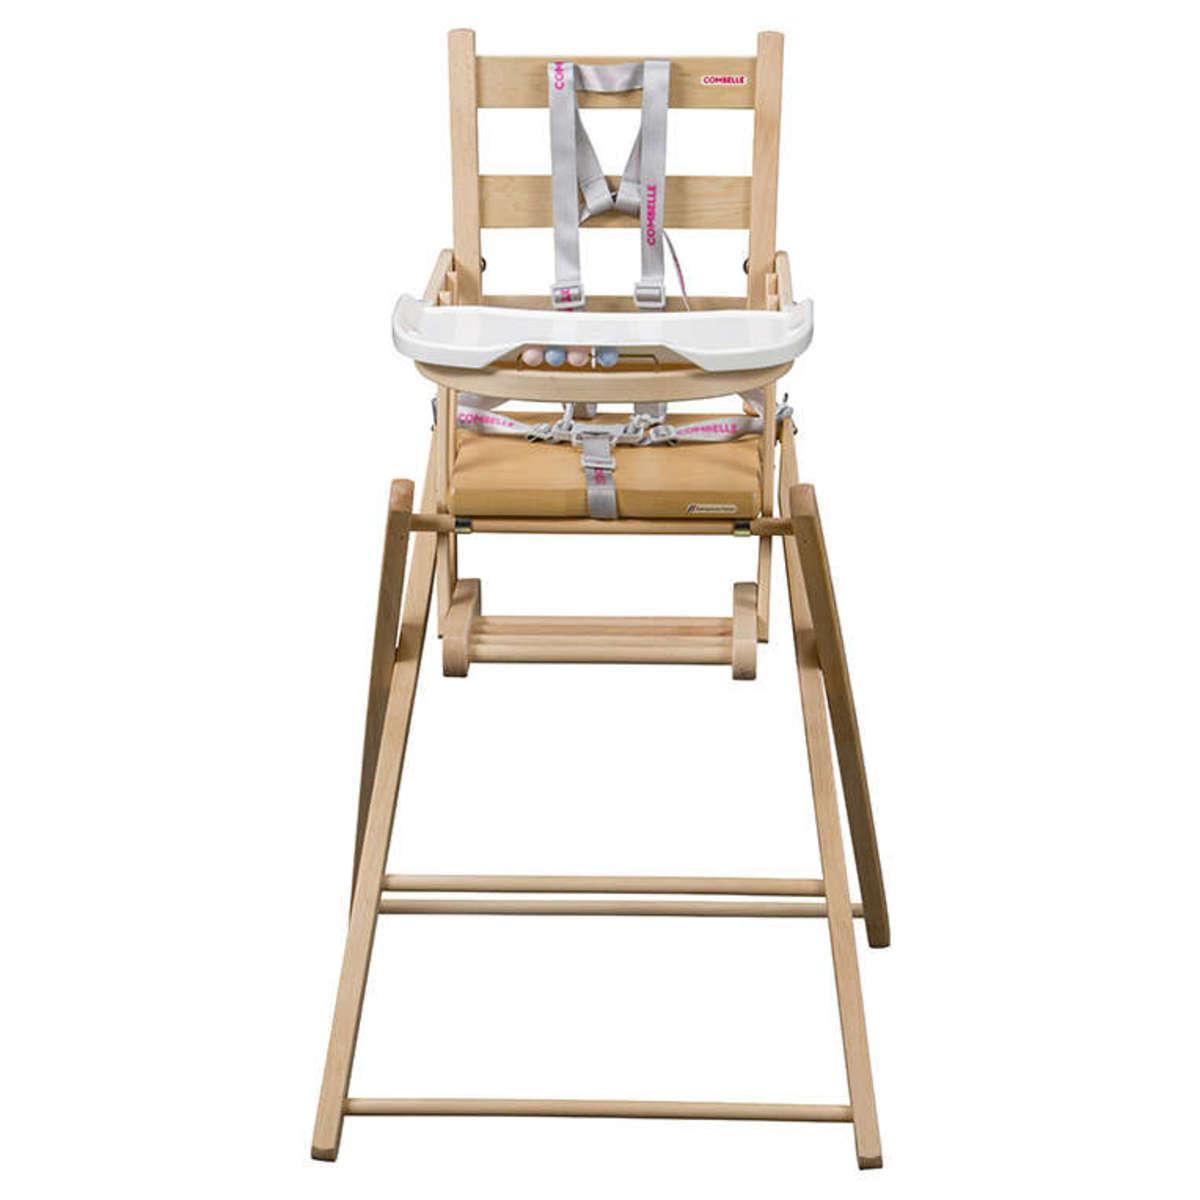 Combelle chaise haute extra pliante sarah chaise haute for Chaise haute combelle pliante